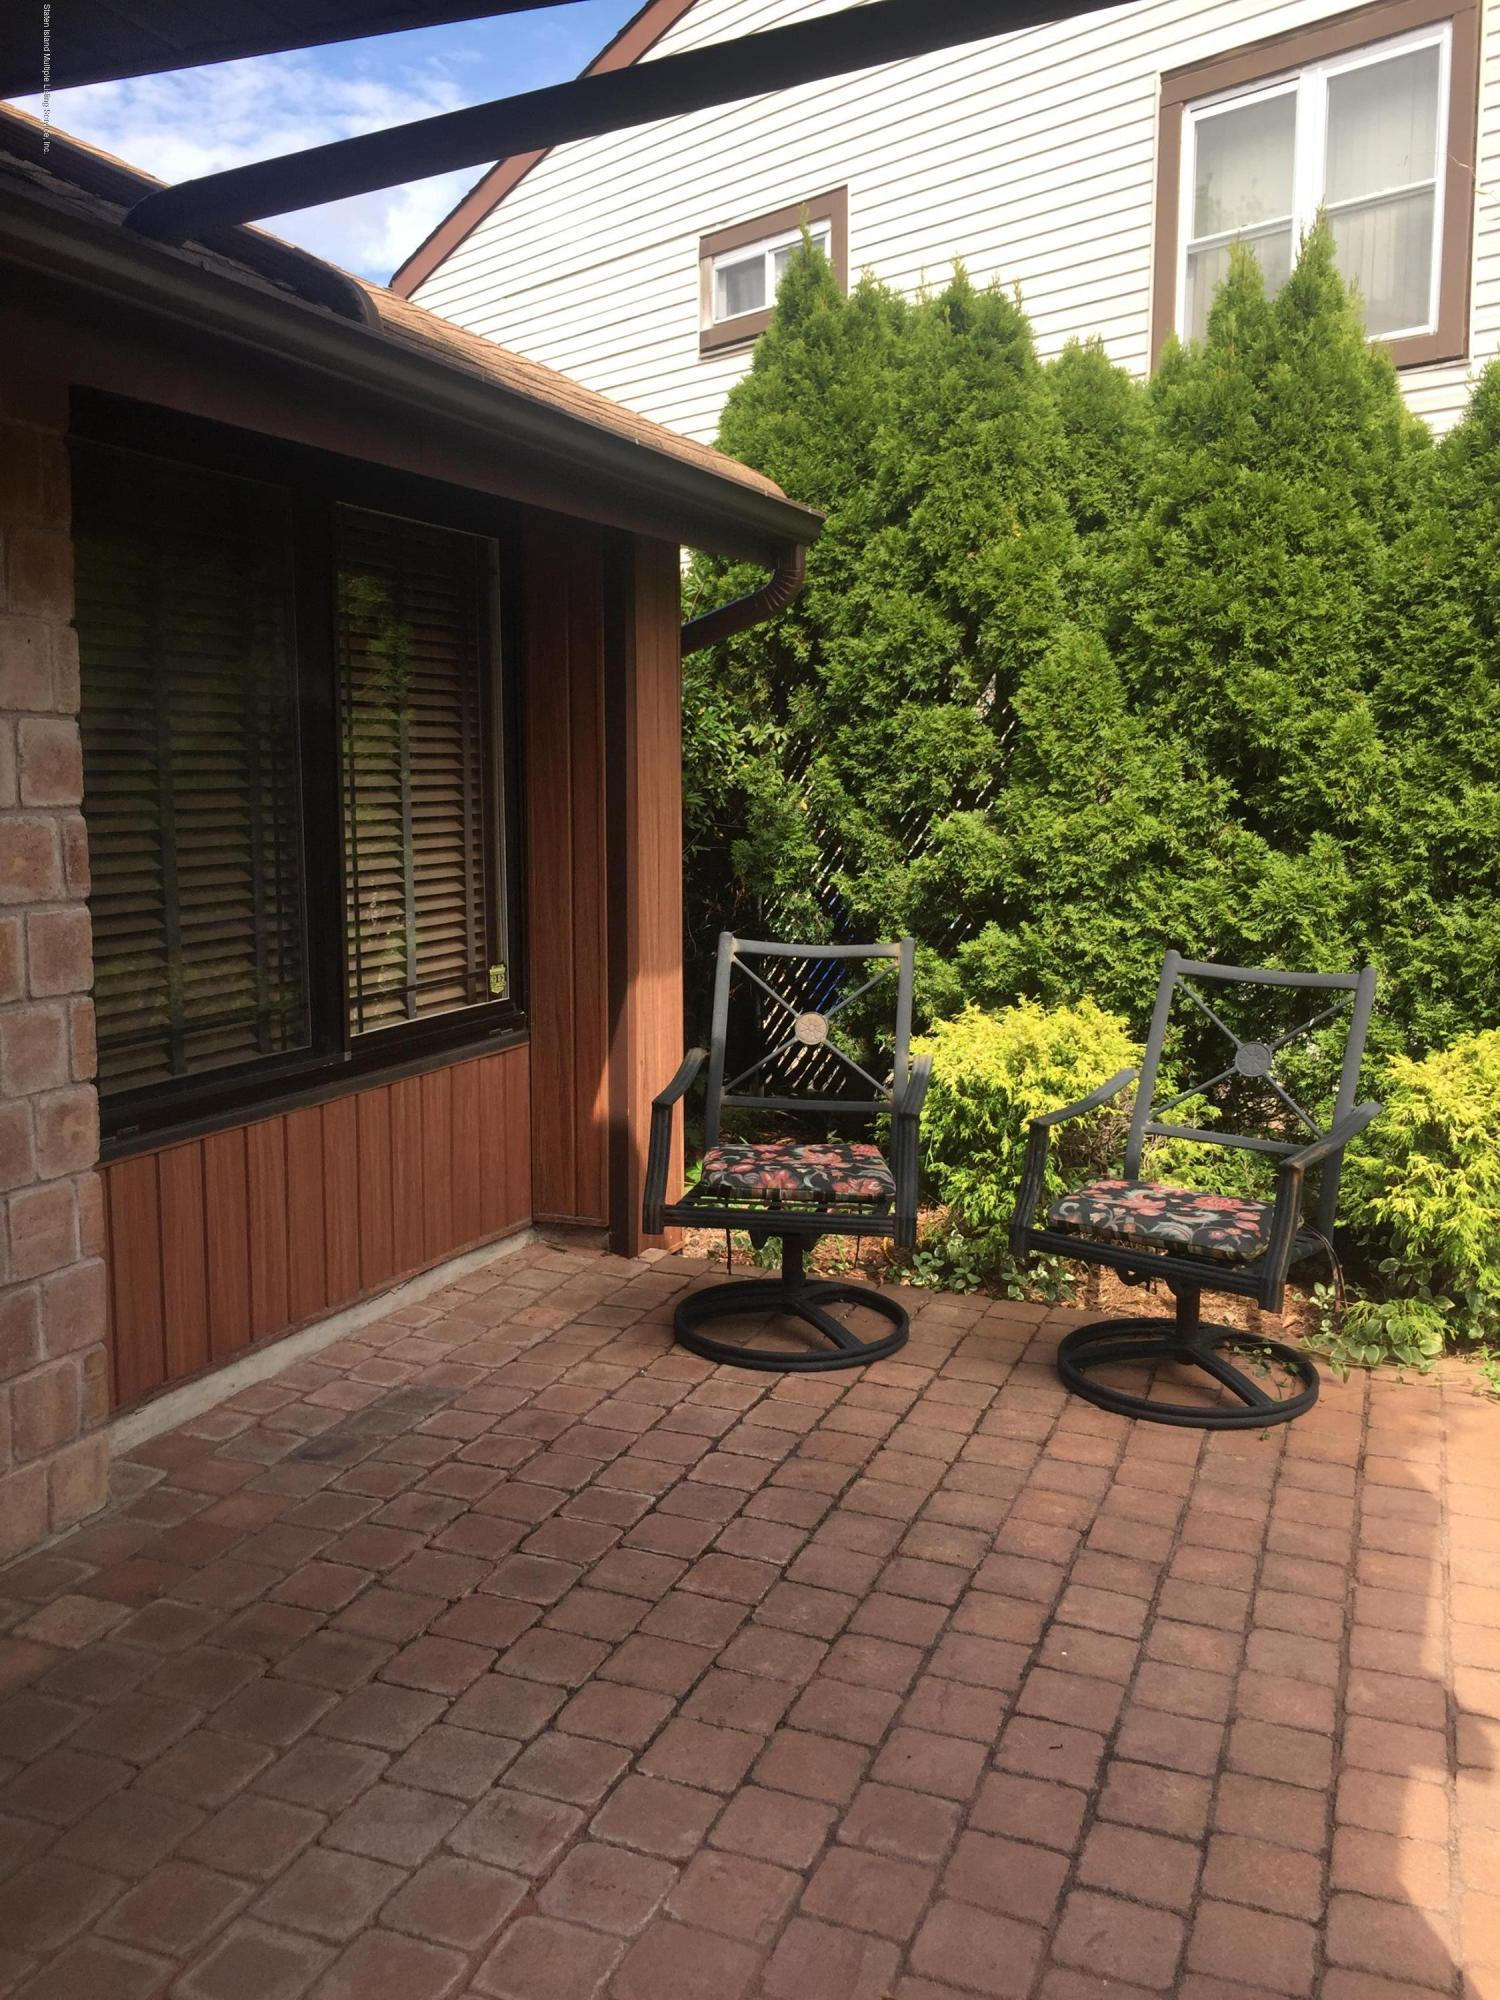 Single Family - Detached 46 Forrestal Avenue  Staten Island, NY 10312, MLS-1131922-4